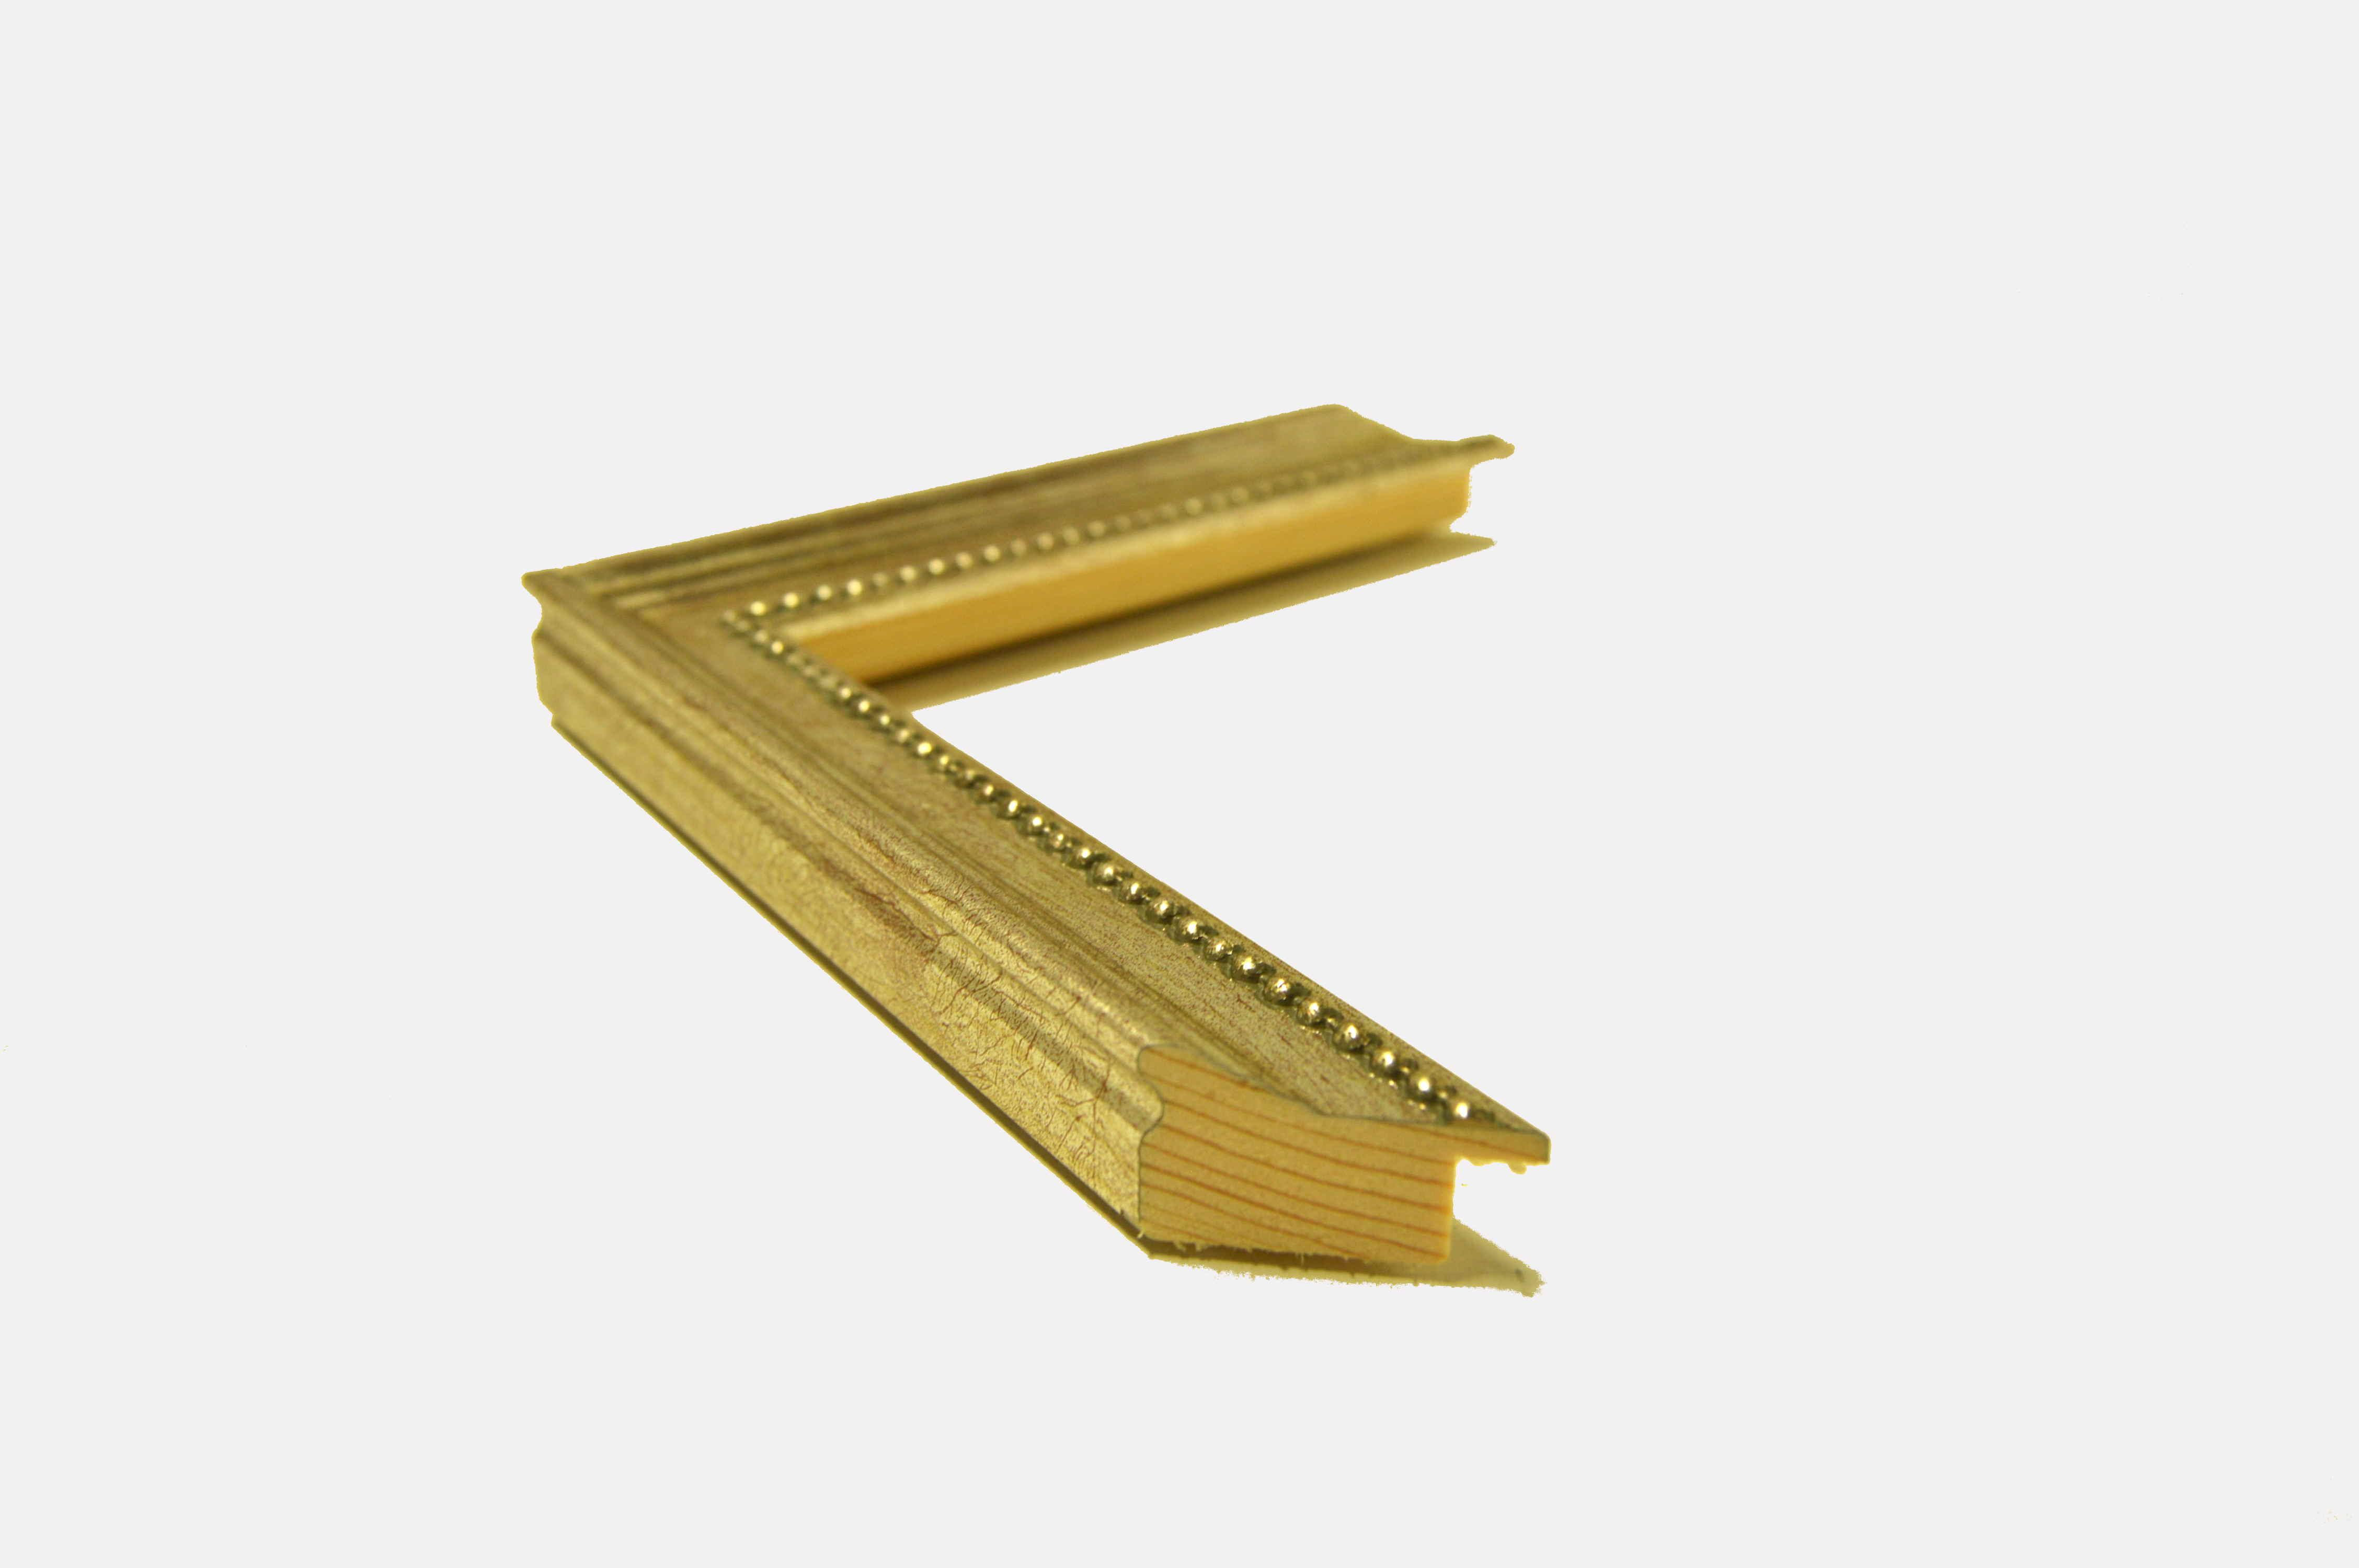 00751-770-PLATA-perfil-ancho2.7cm